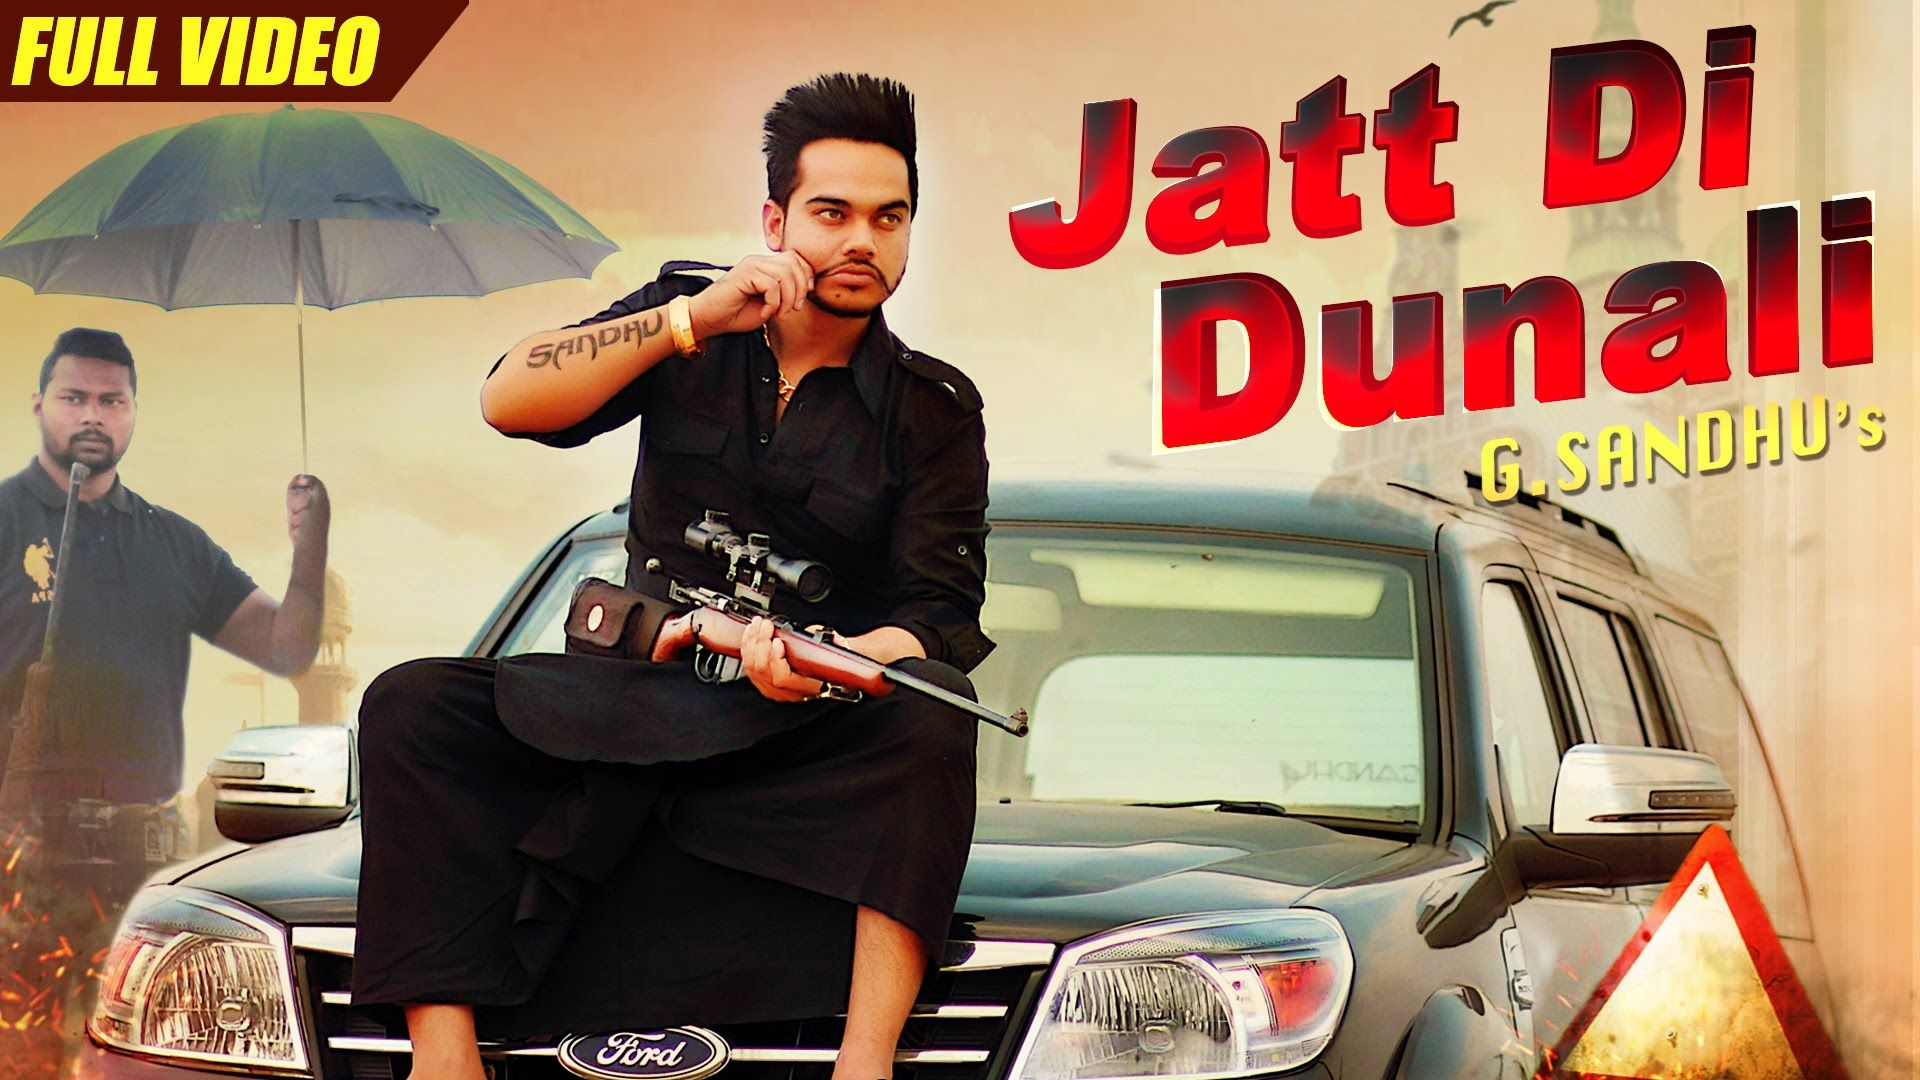 Jatt di dunali g sandhu latest punjabi songs 2016